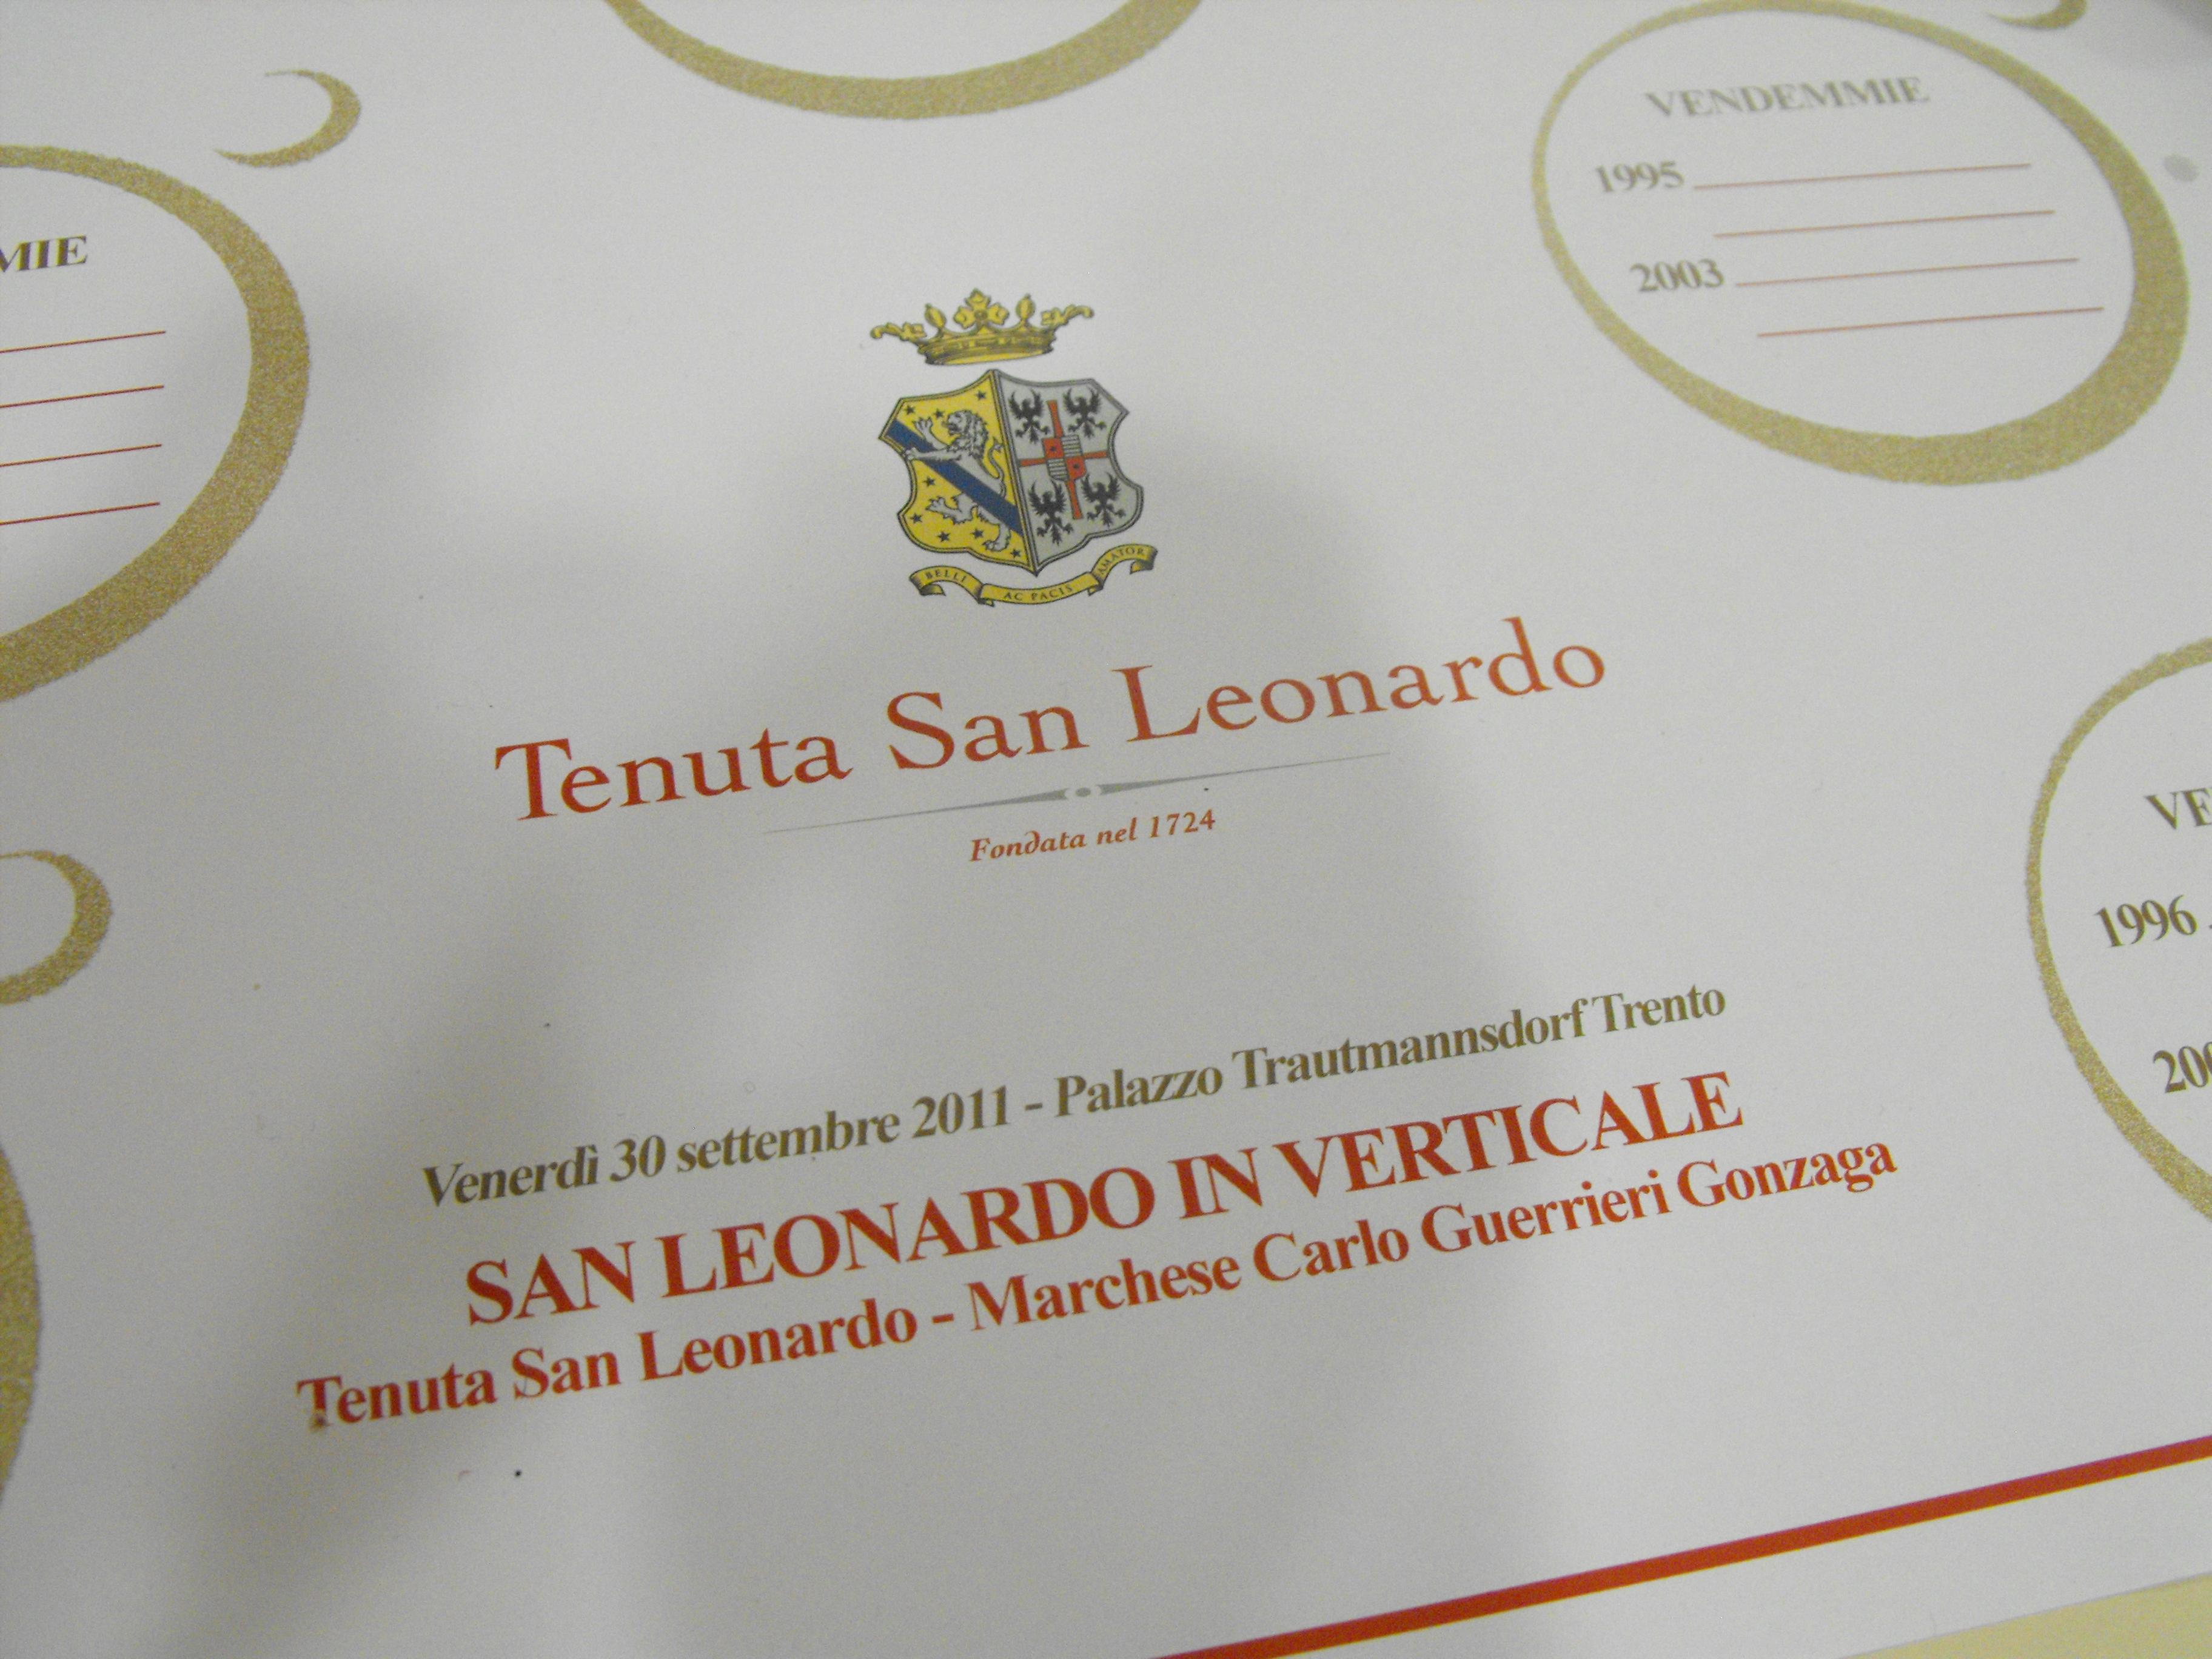 San Leonardo - verticale